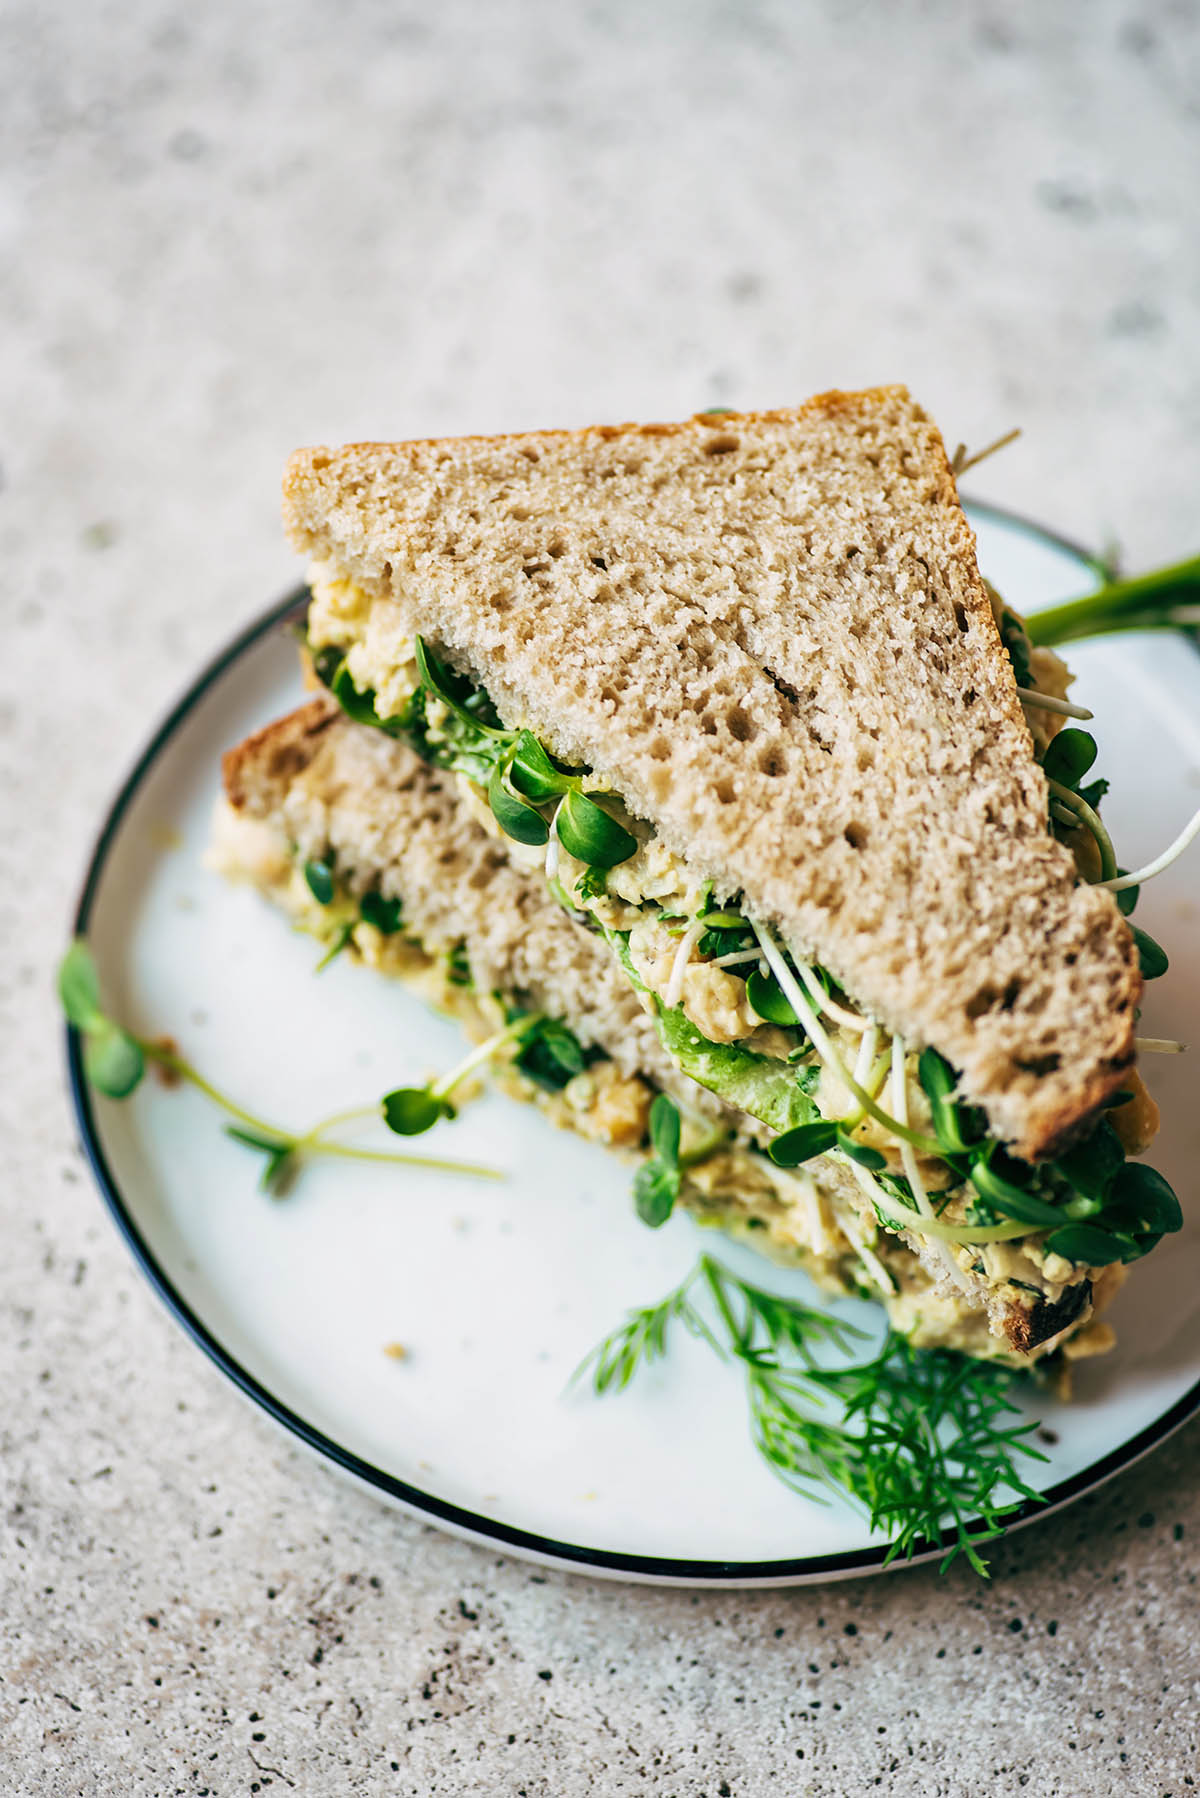 A sandwich on a plate.